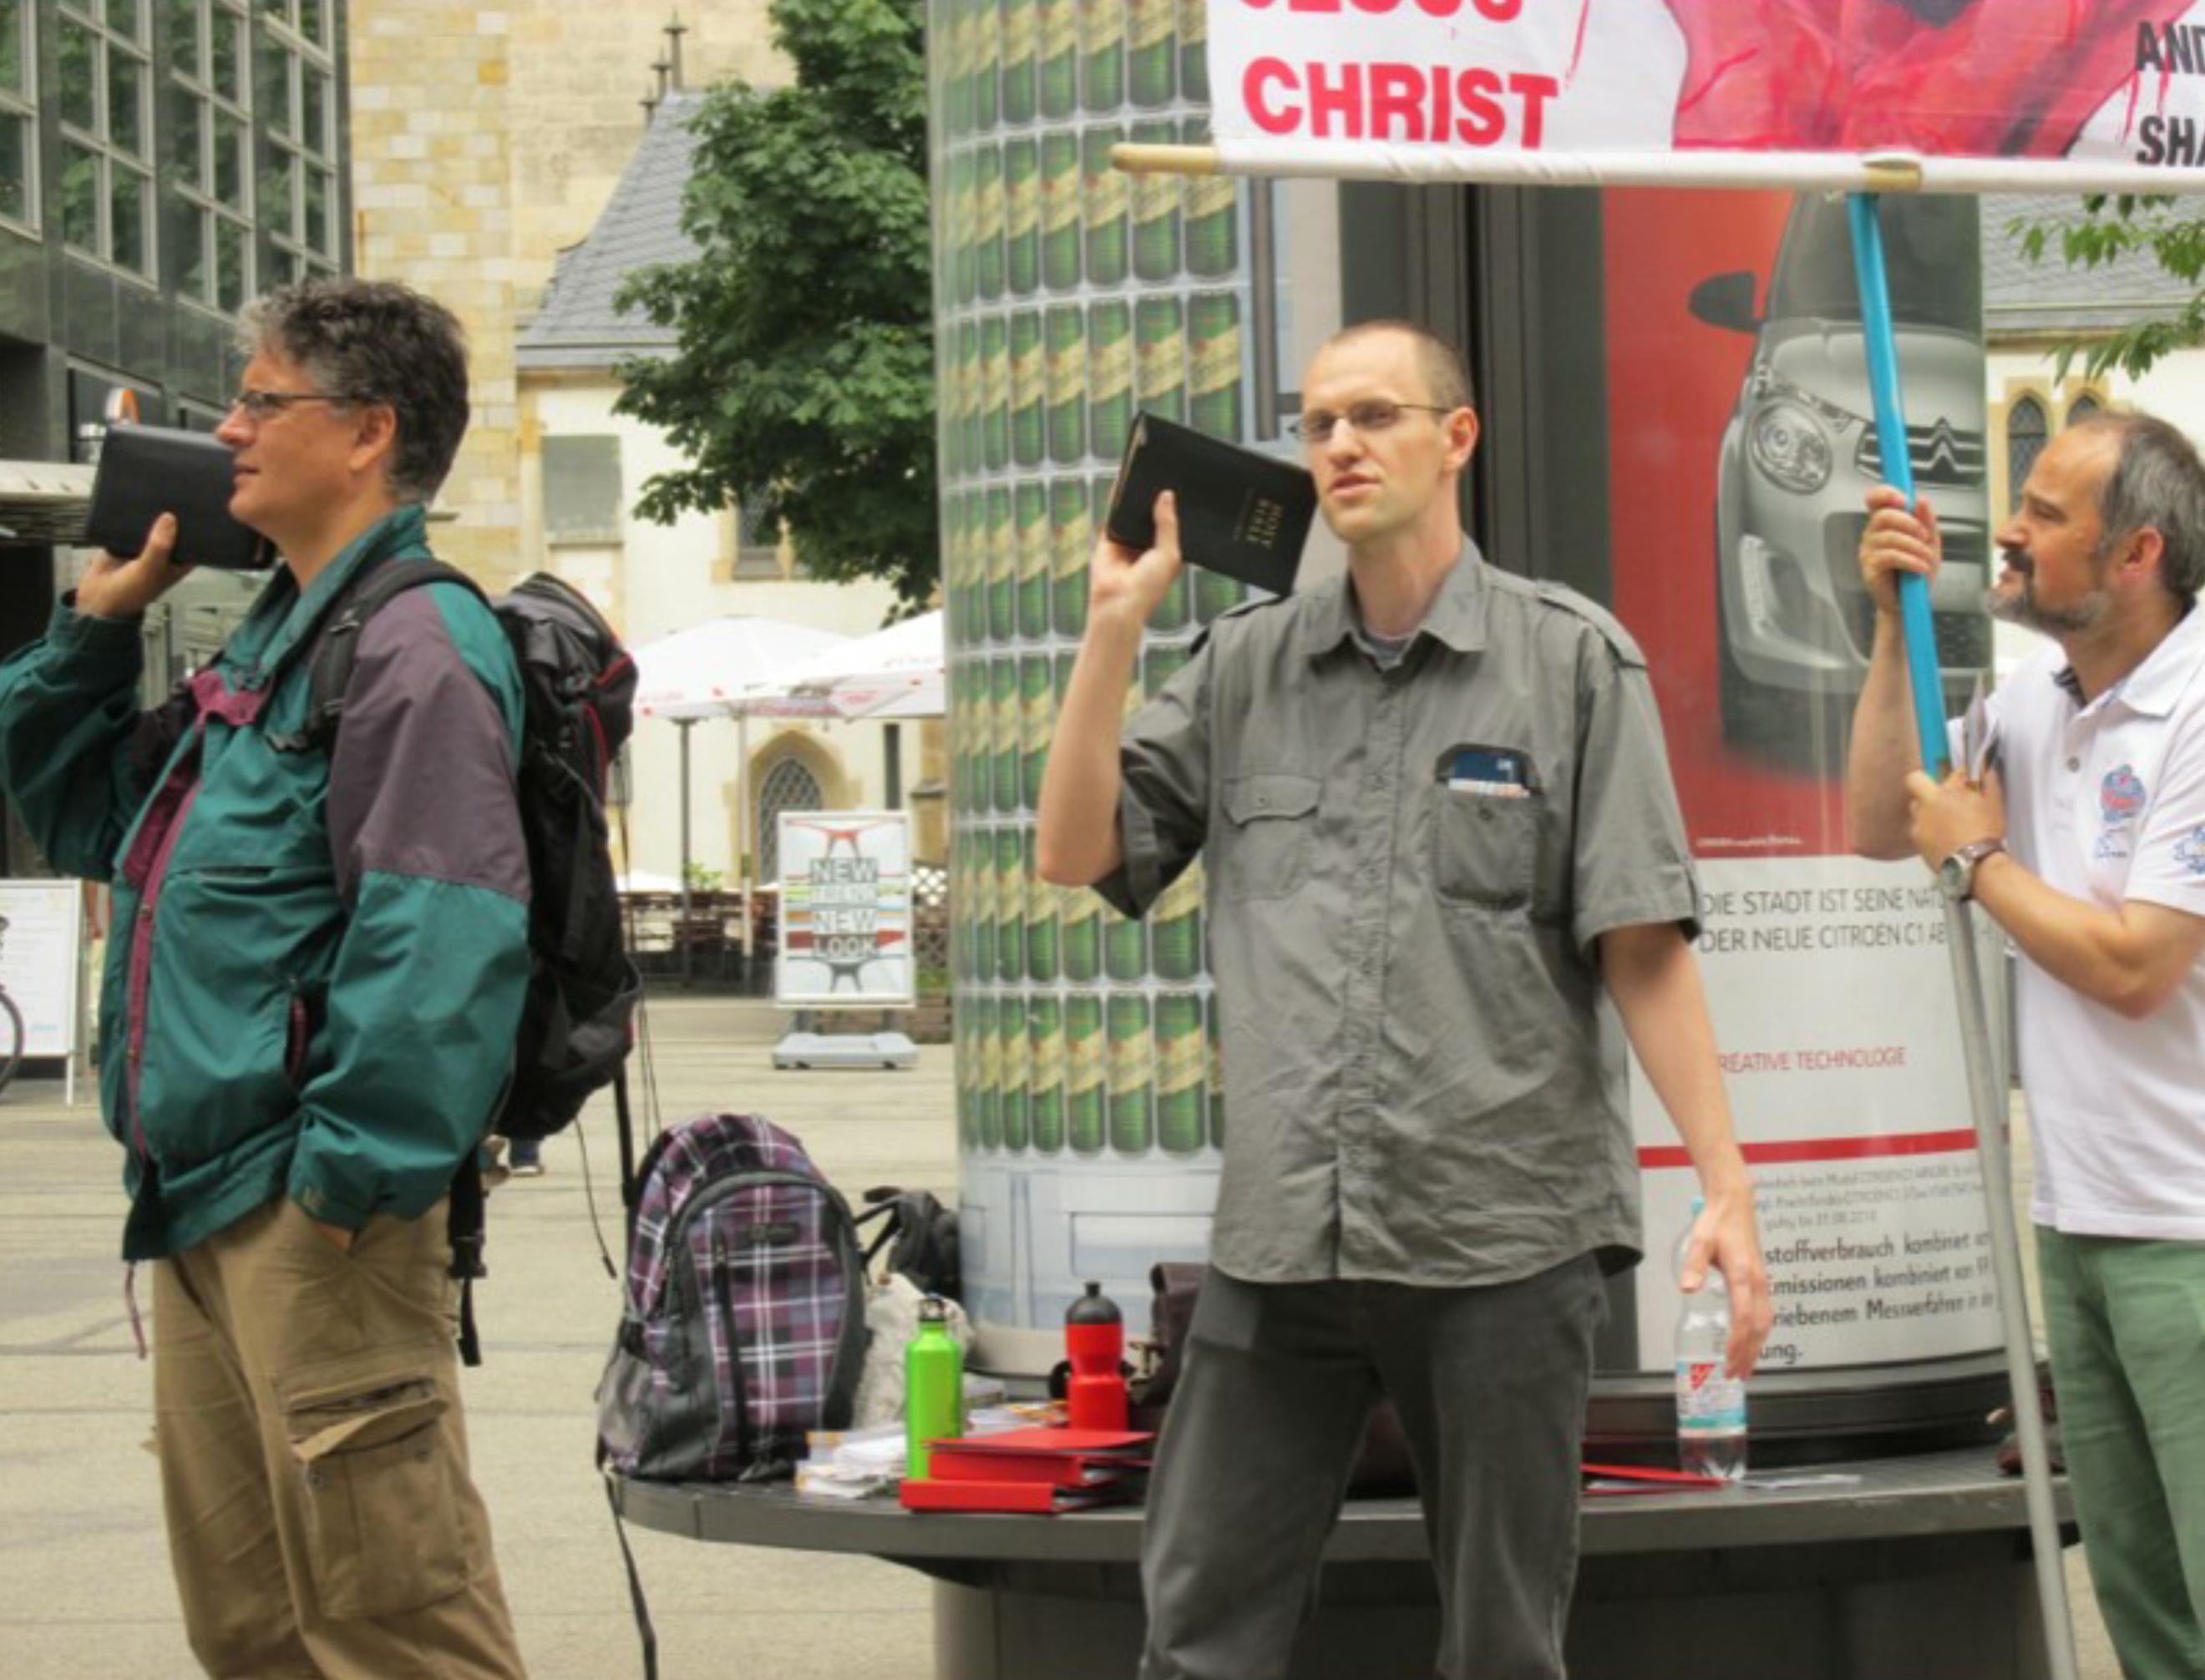 Street Preaching pic 2